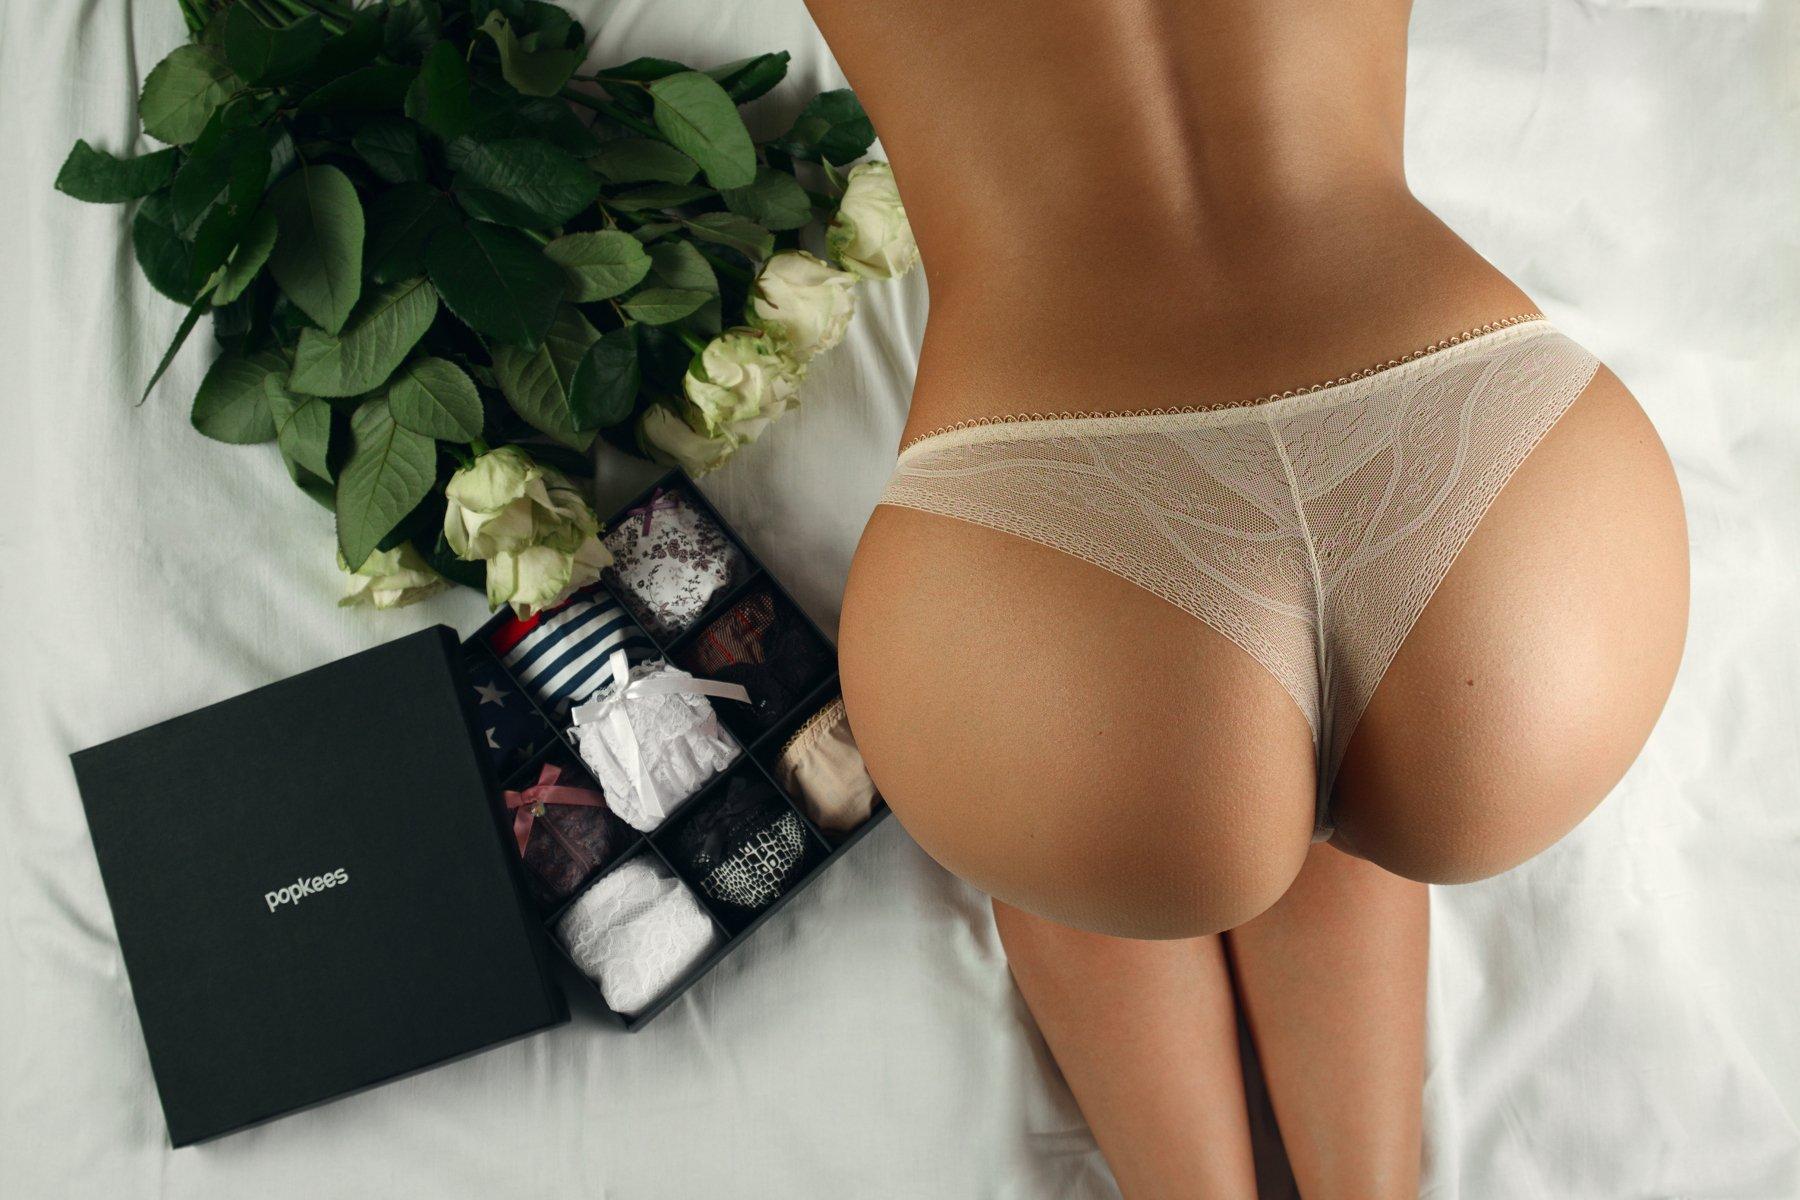 popkees, ass, butt, advertising, underpants, pants, underwear, sale, sexy, Роман Филиппов